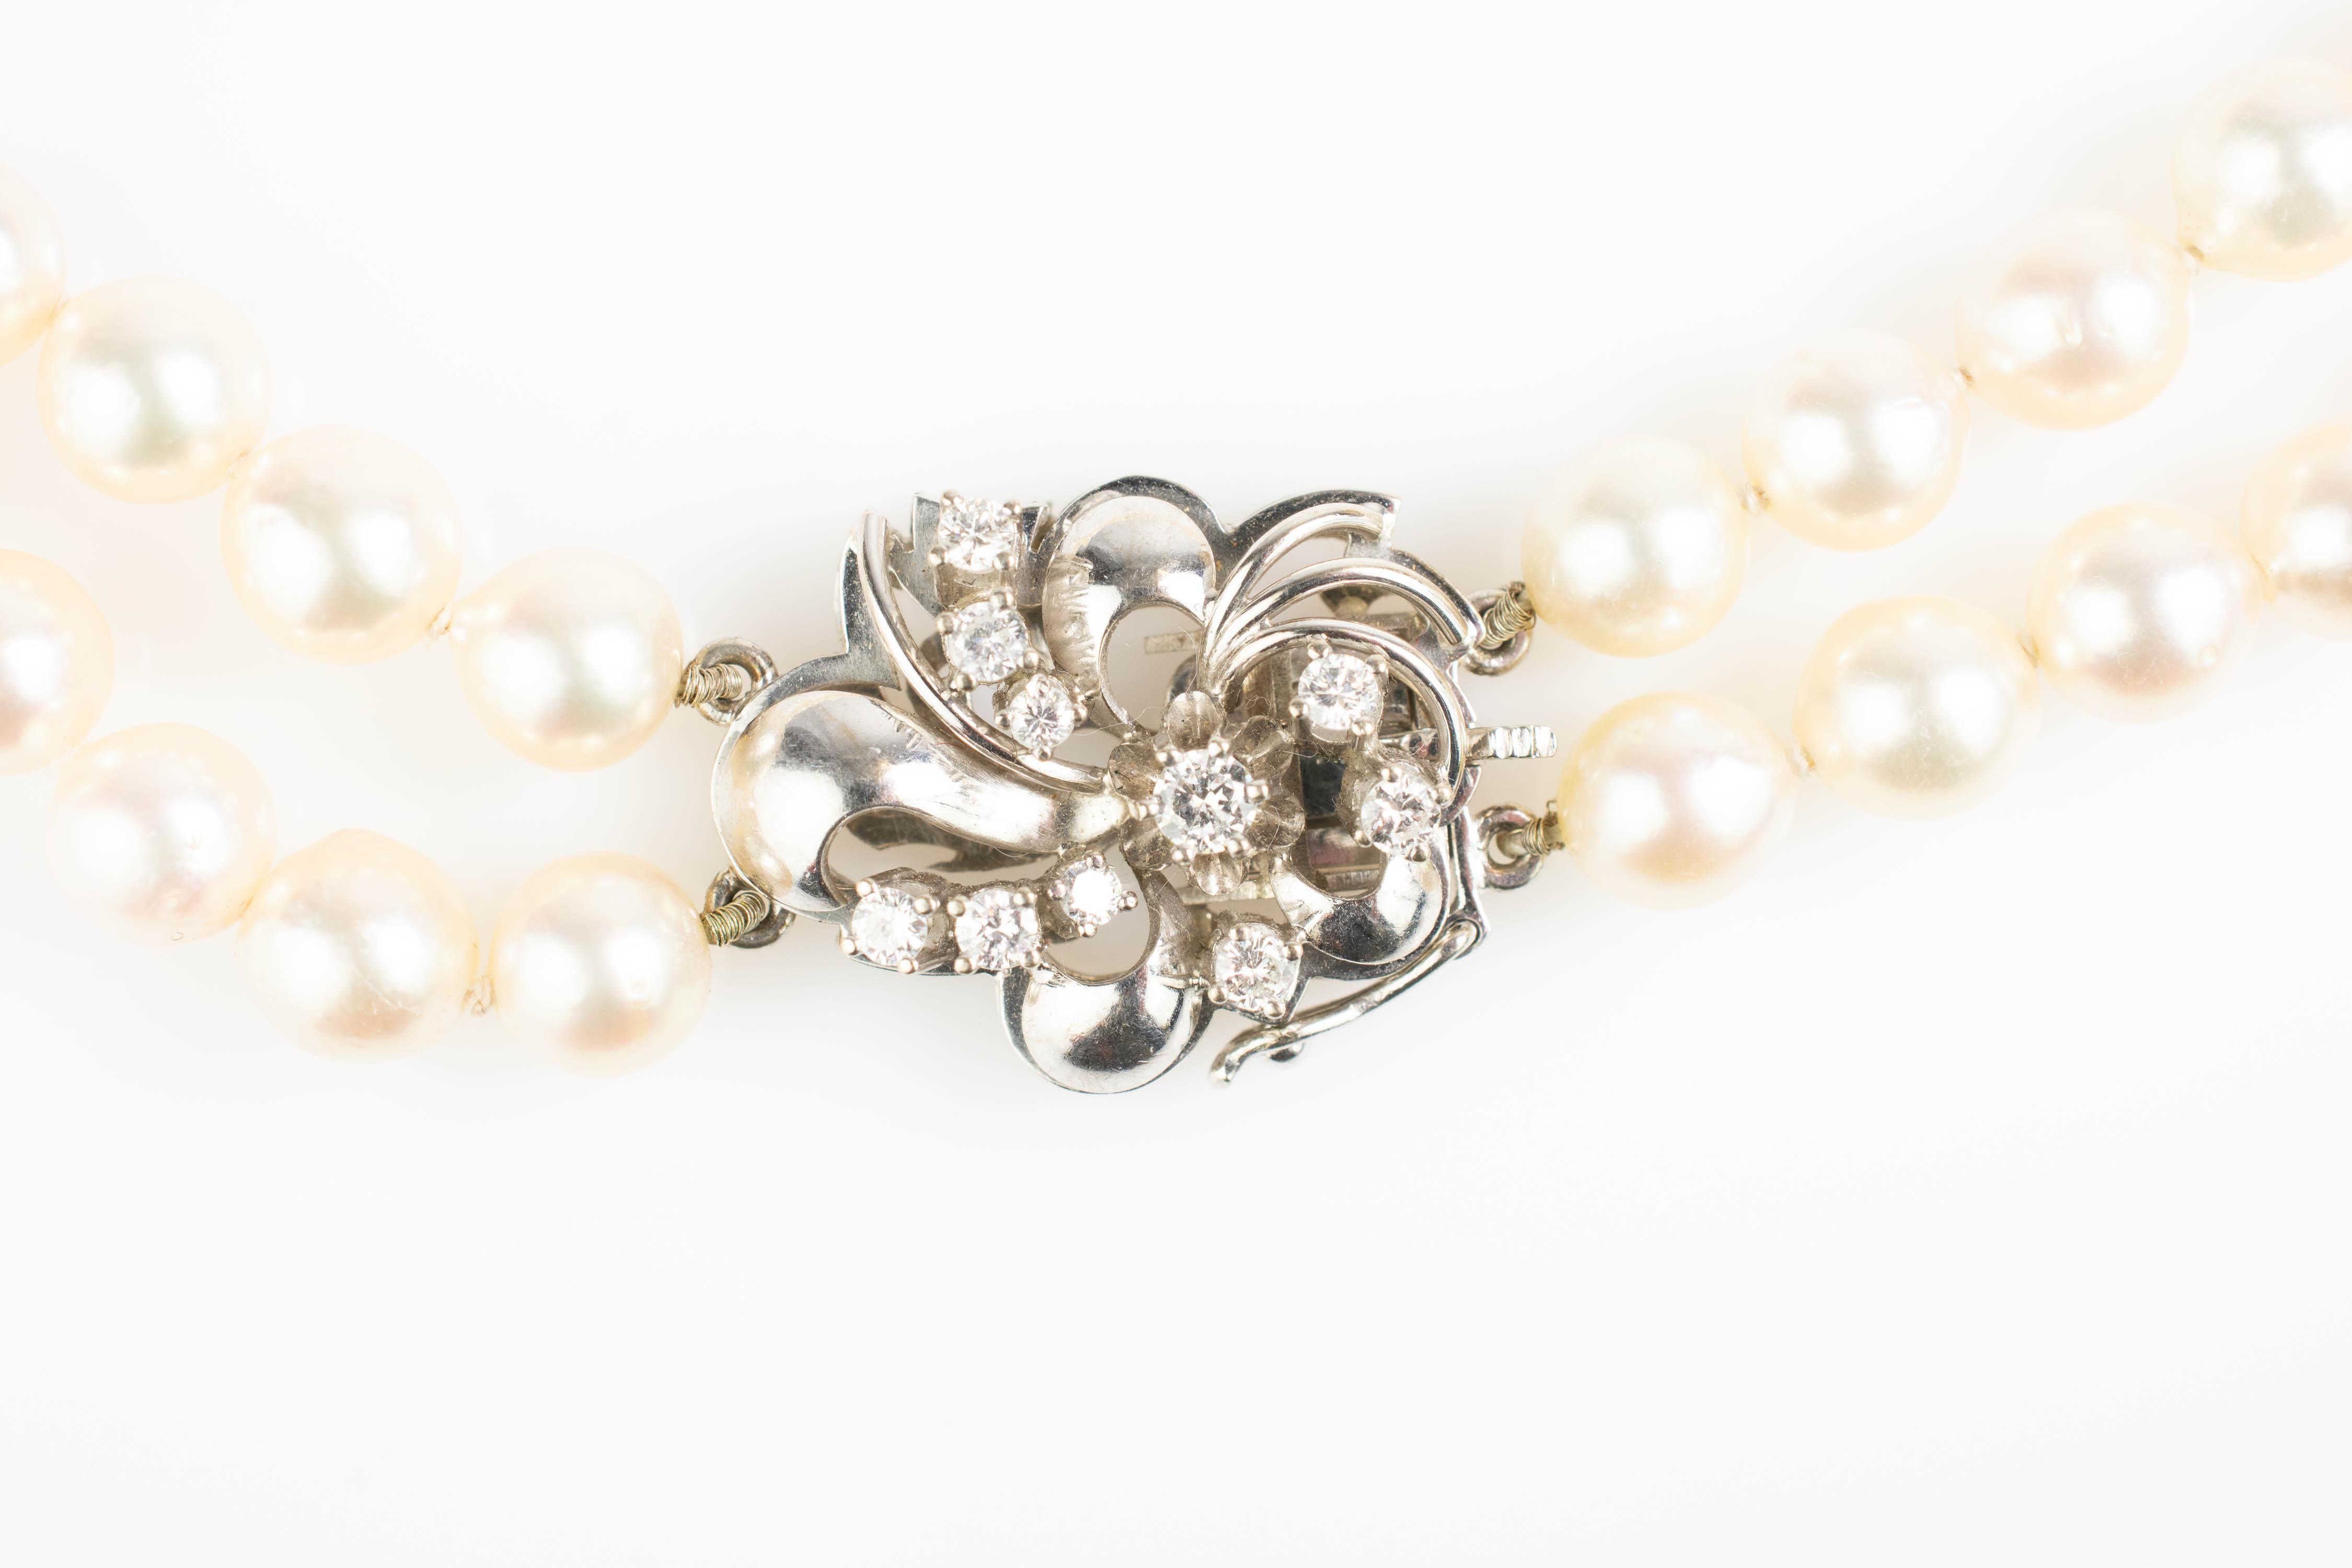 Perlenkette - Image 2 of 3